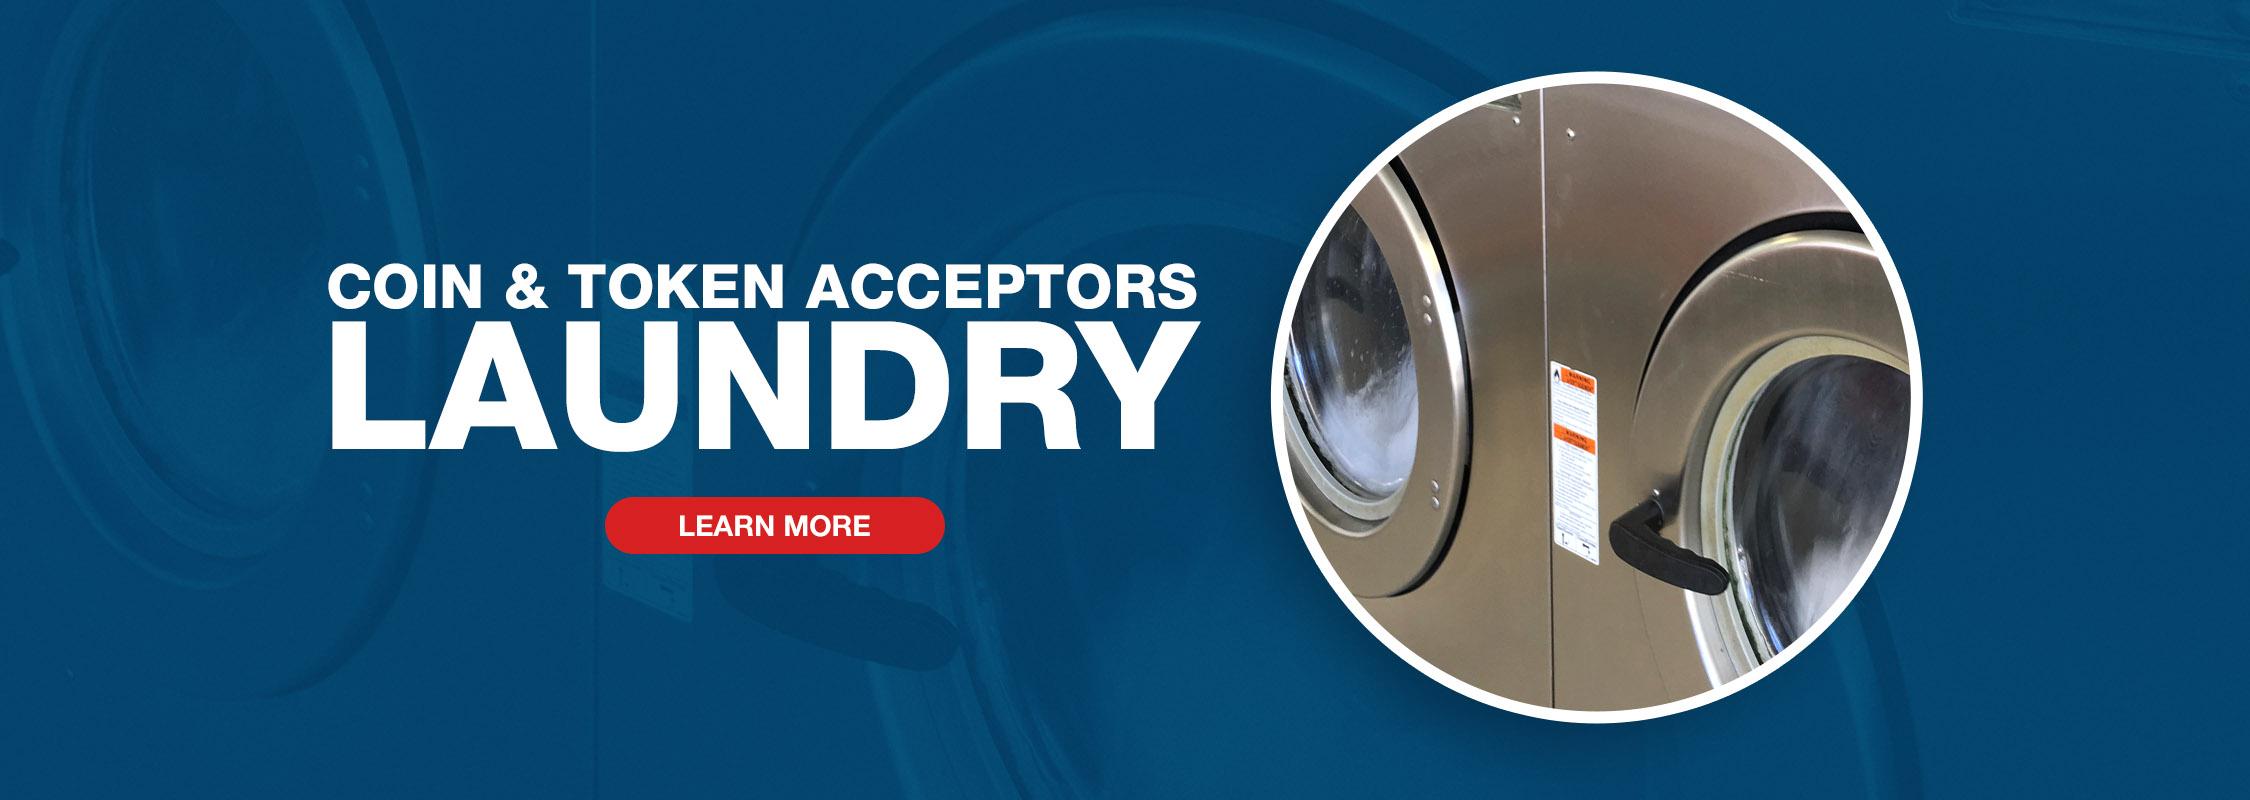 Imonex Coin & Token Acceptors - Laundry Image